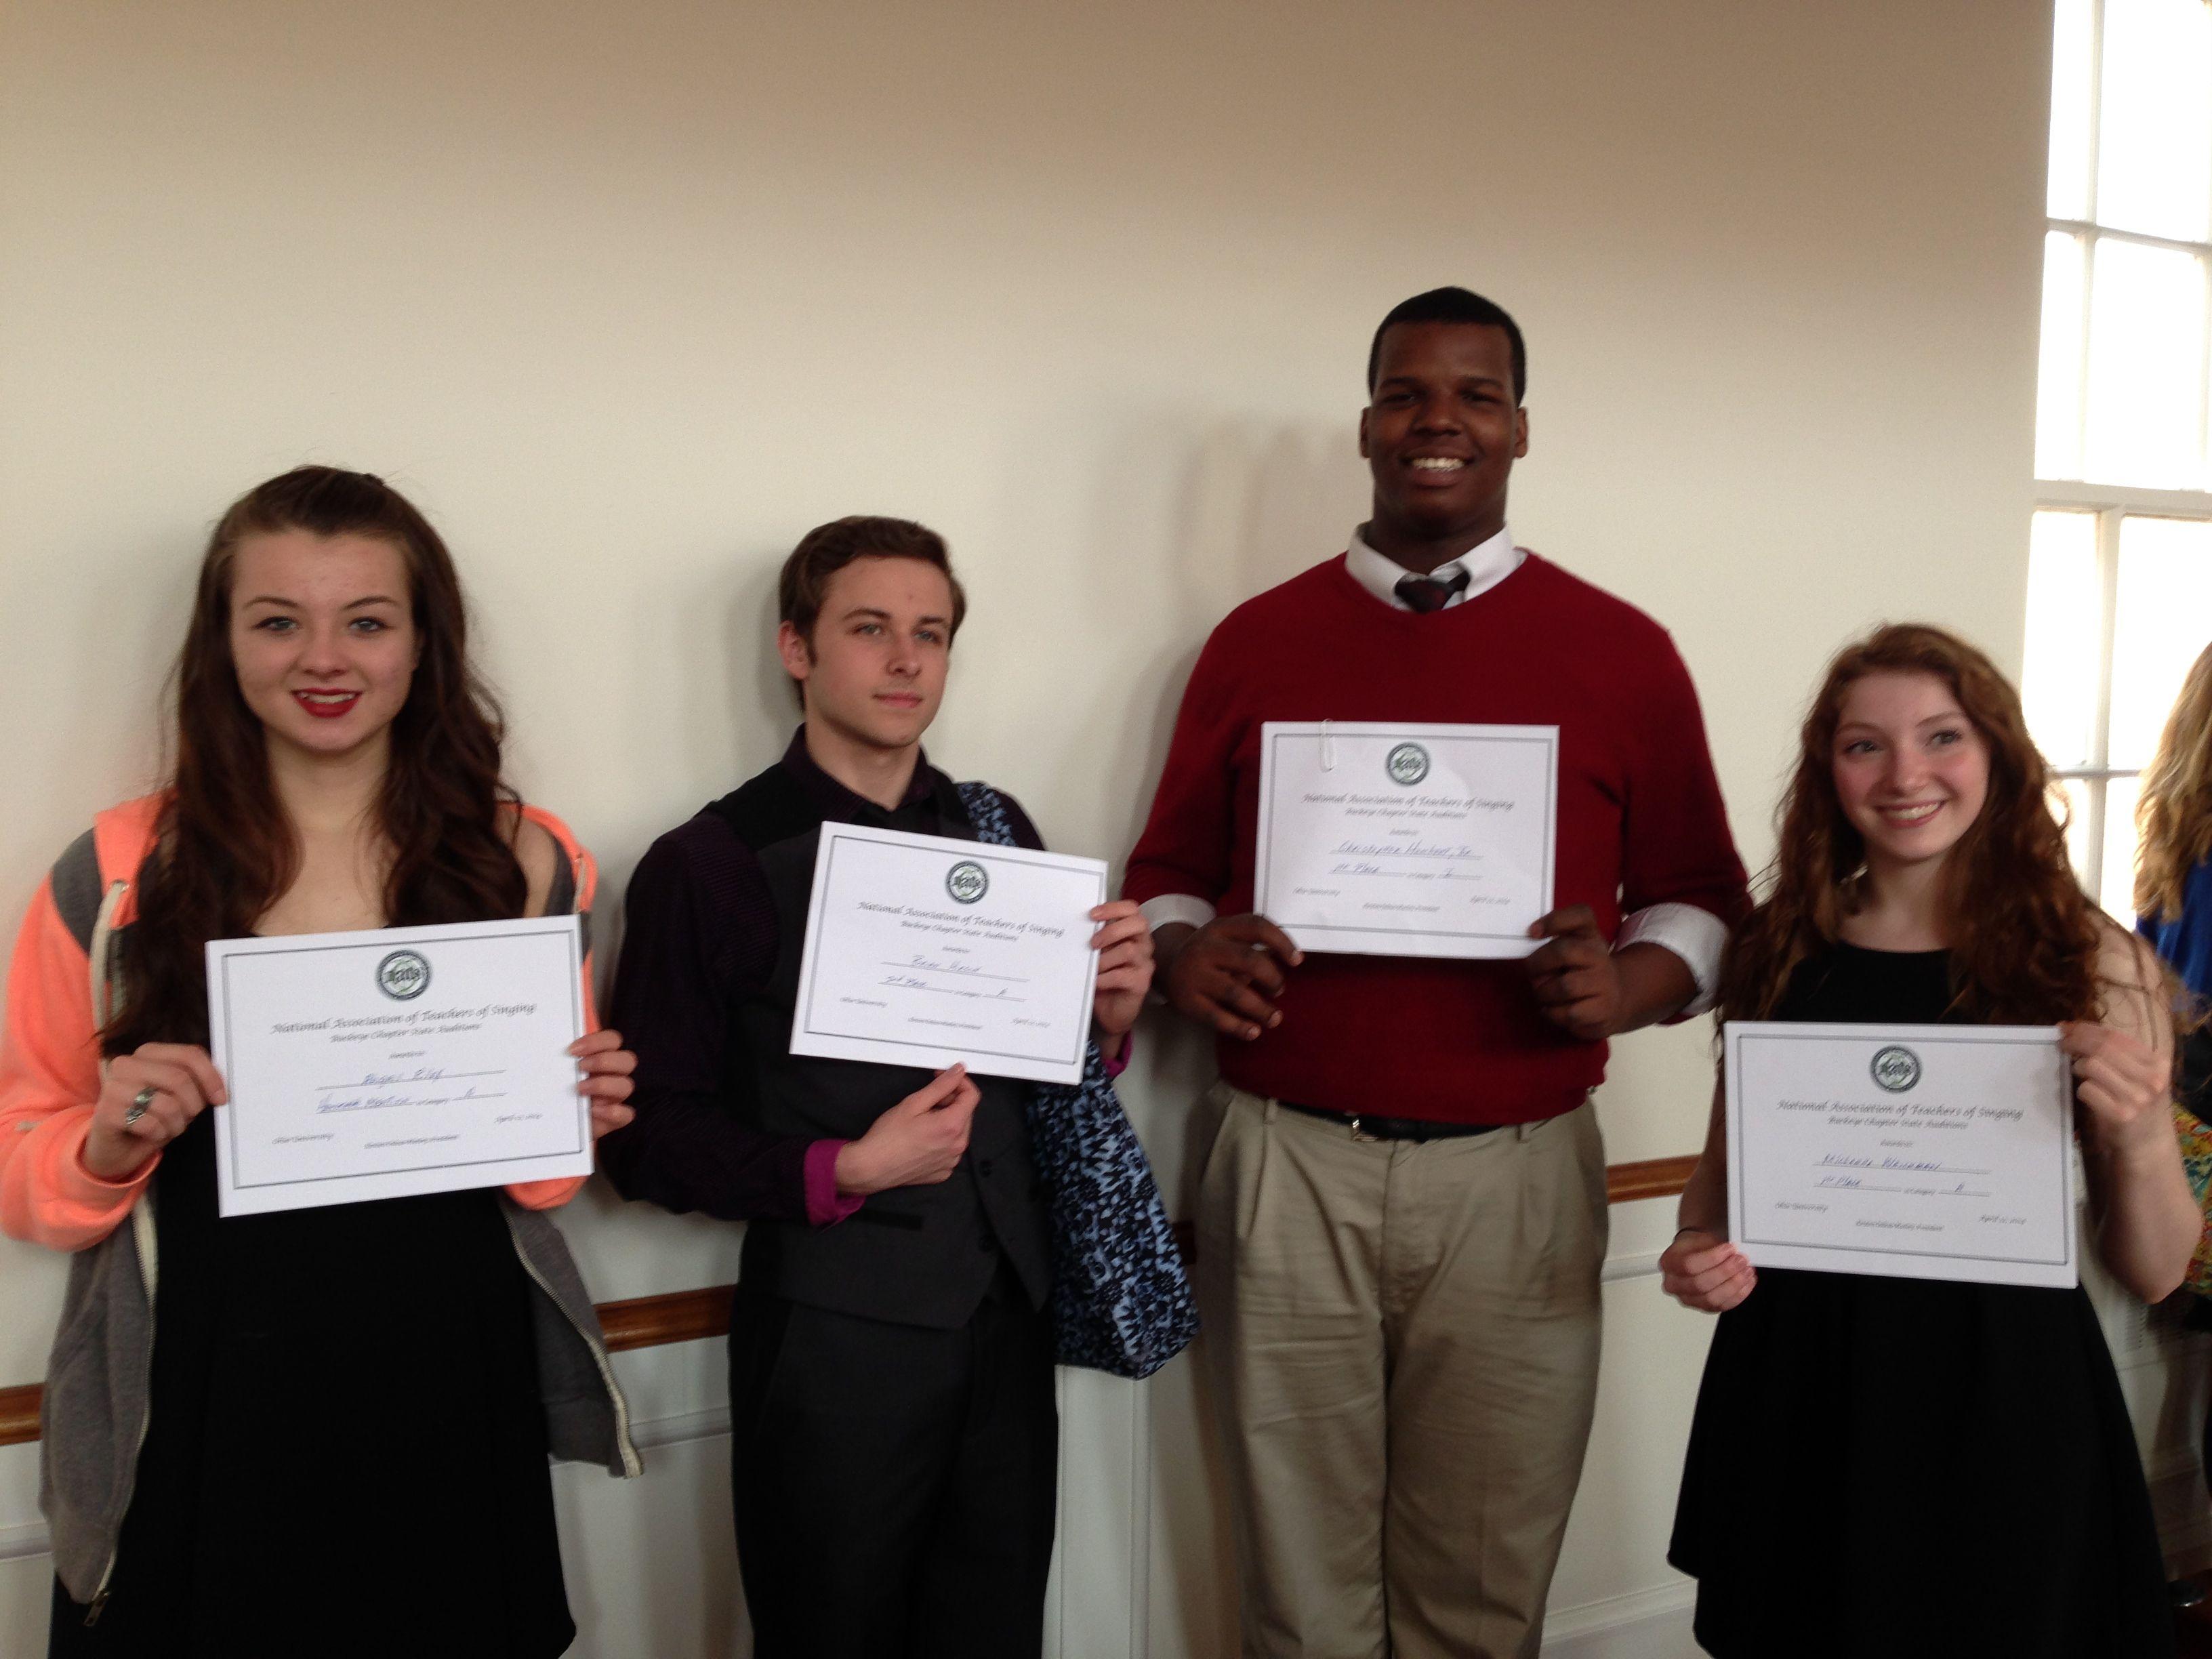 Nats 2014 Certificates